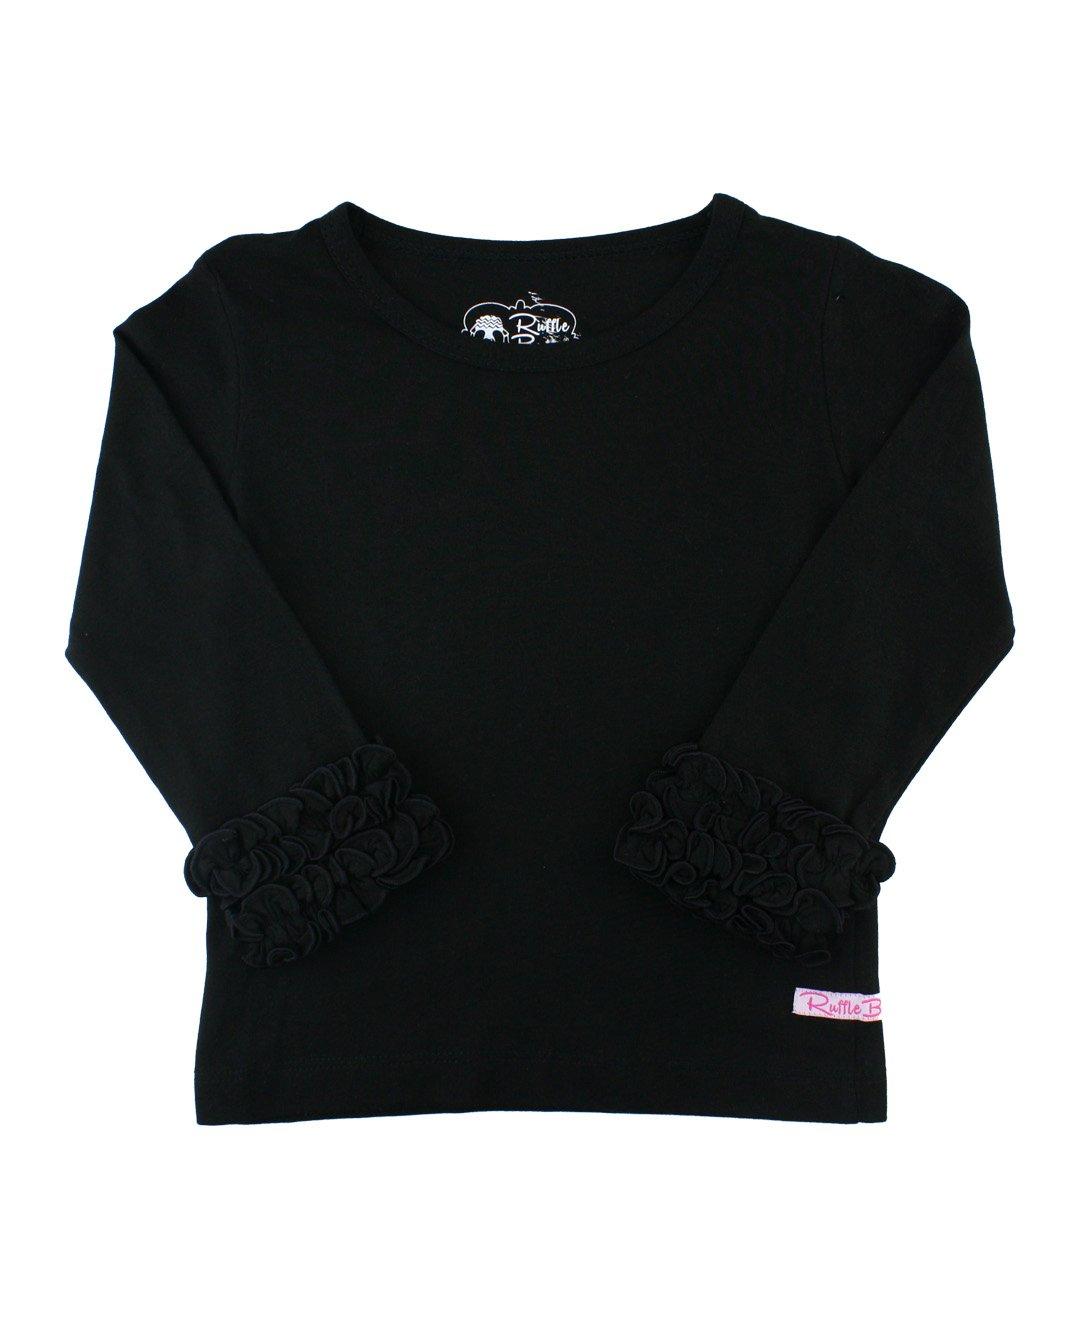 RuffleButts Girls Black Ruffled Long Sleeve Layering Tee - 8